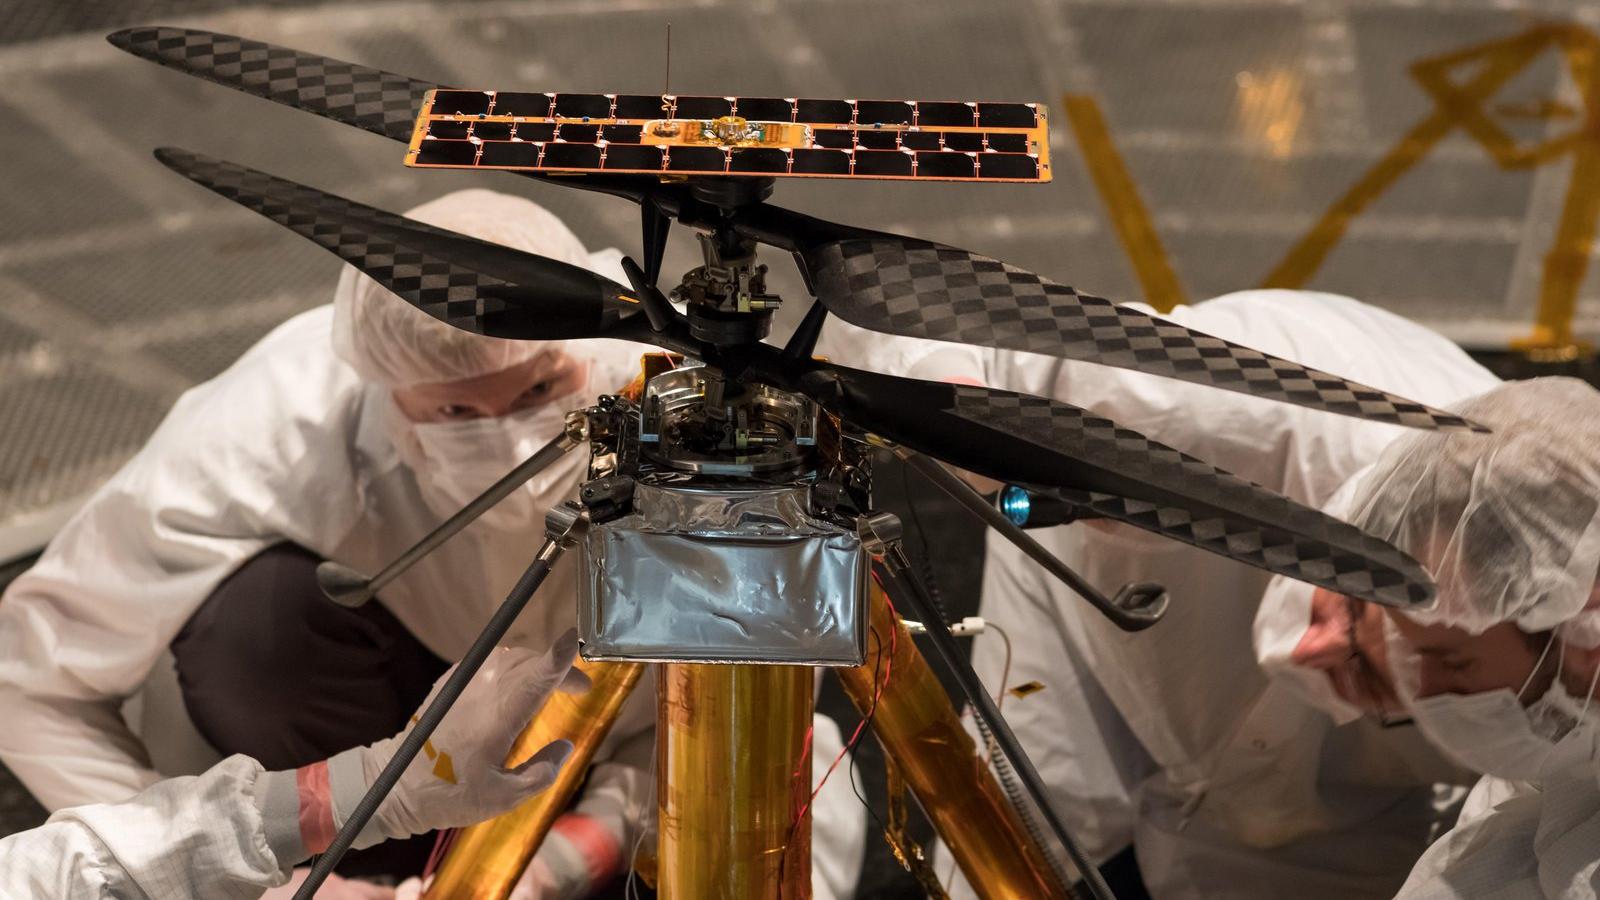 mashable.com - Adam Rosenberg - NASA plans rescheduled Mars Ingenuity helicopter flight for April 19